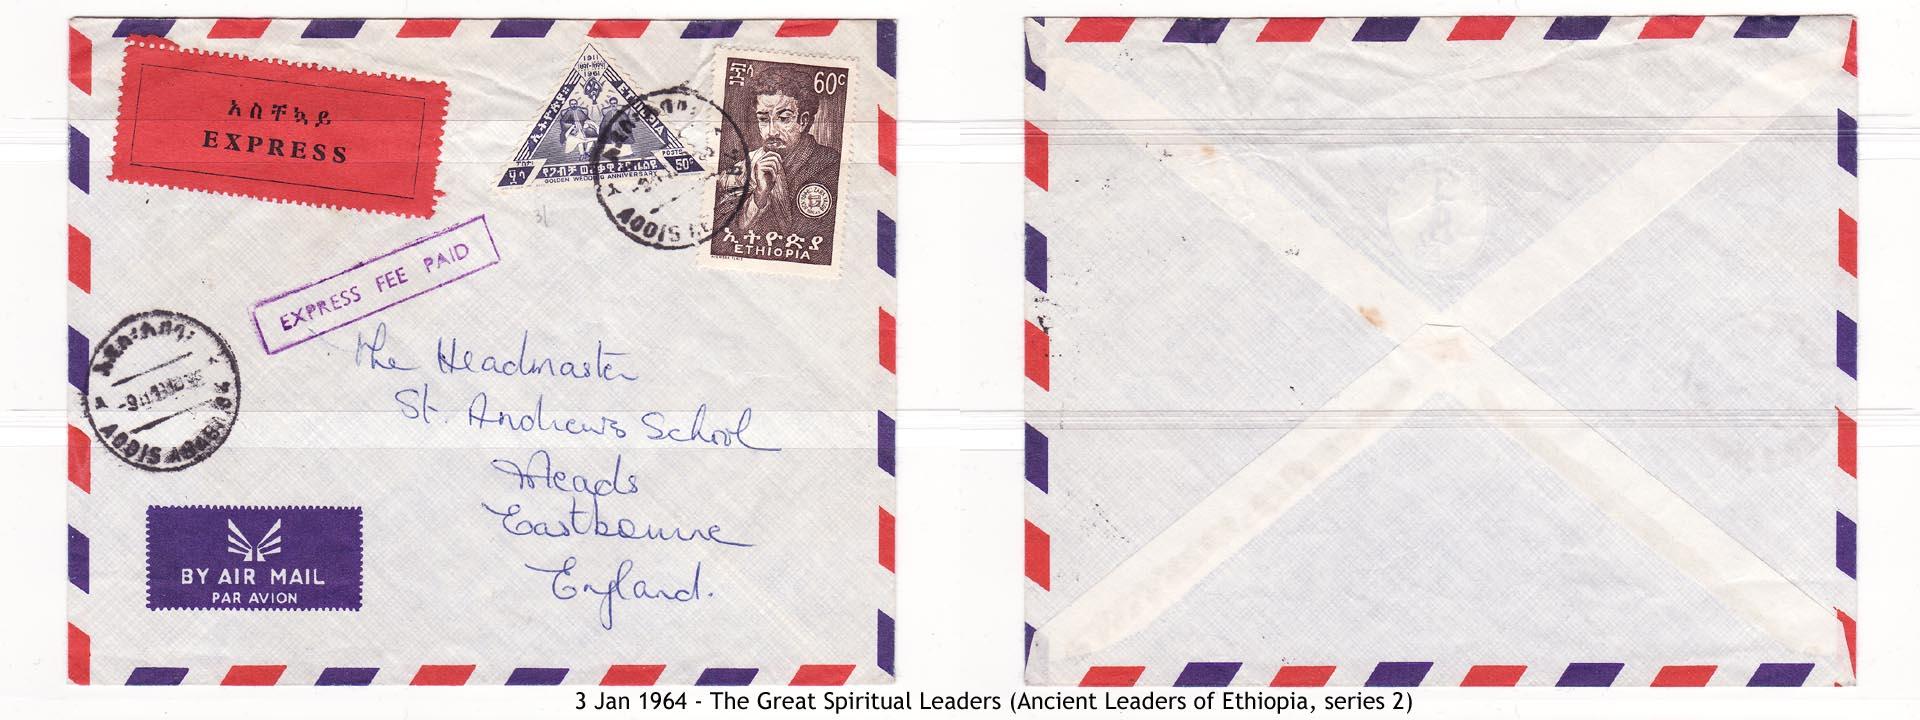 19640103 – The Great Spiritual Leaders (Ancient Leaders of Ethiopia, series 2)